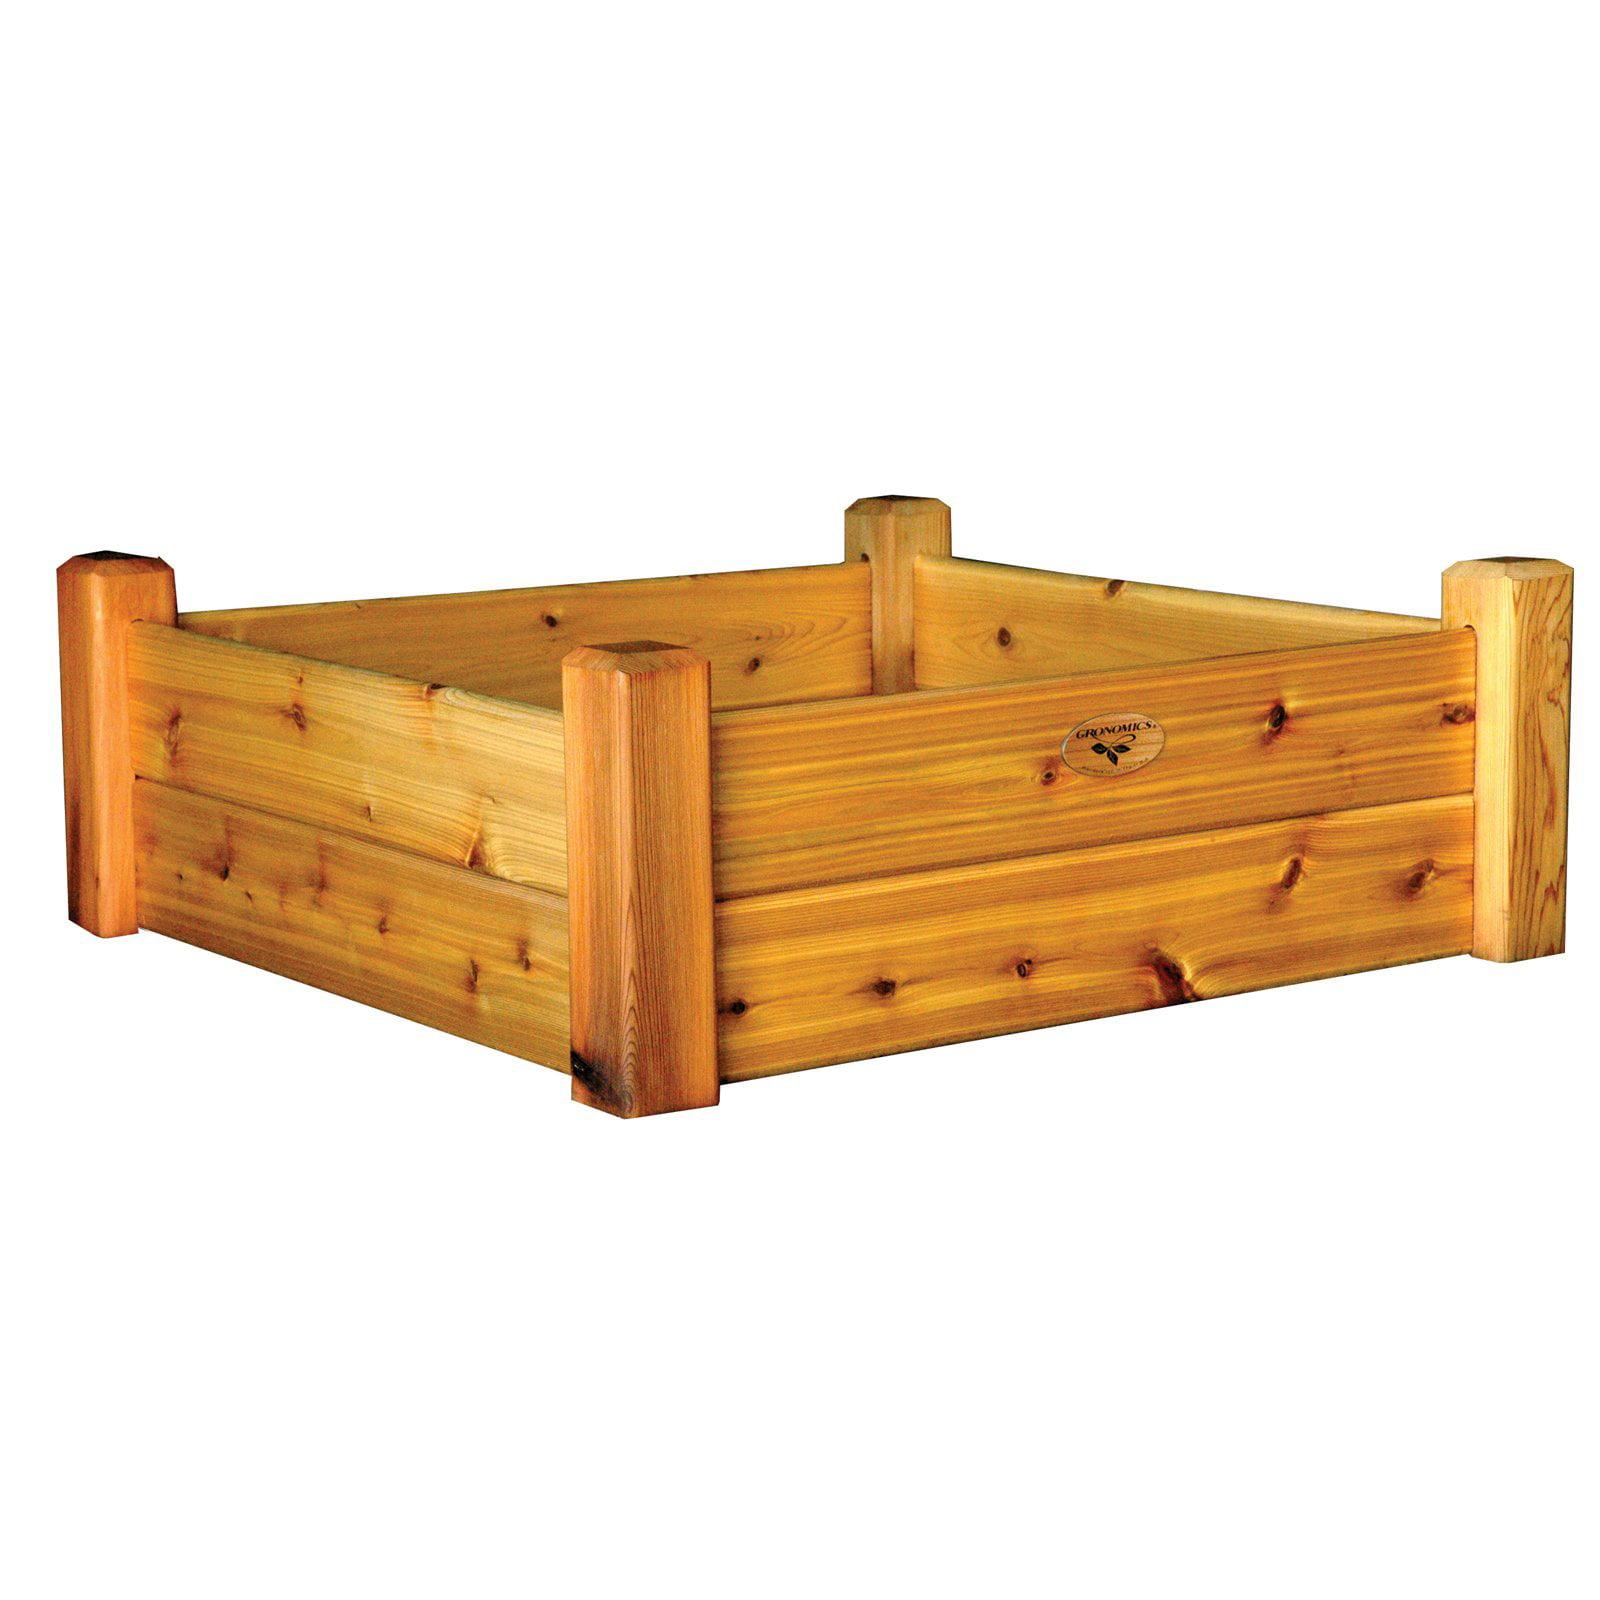 kit amazon garden inch of plastic greenland kits elegant designs cedar bed gardener raised